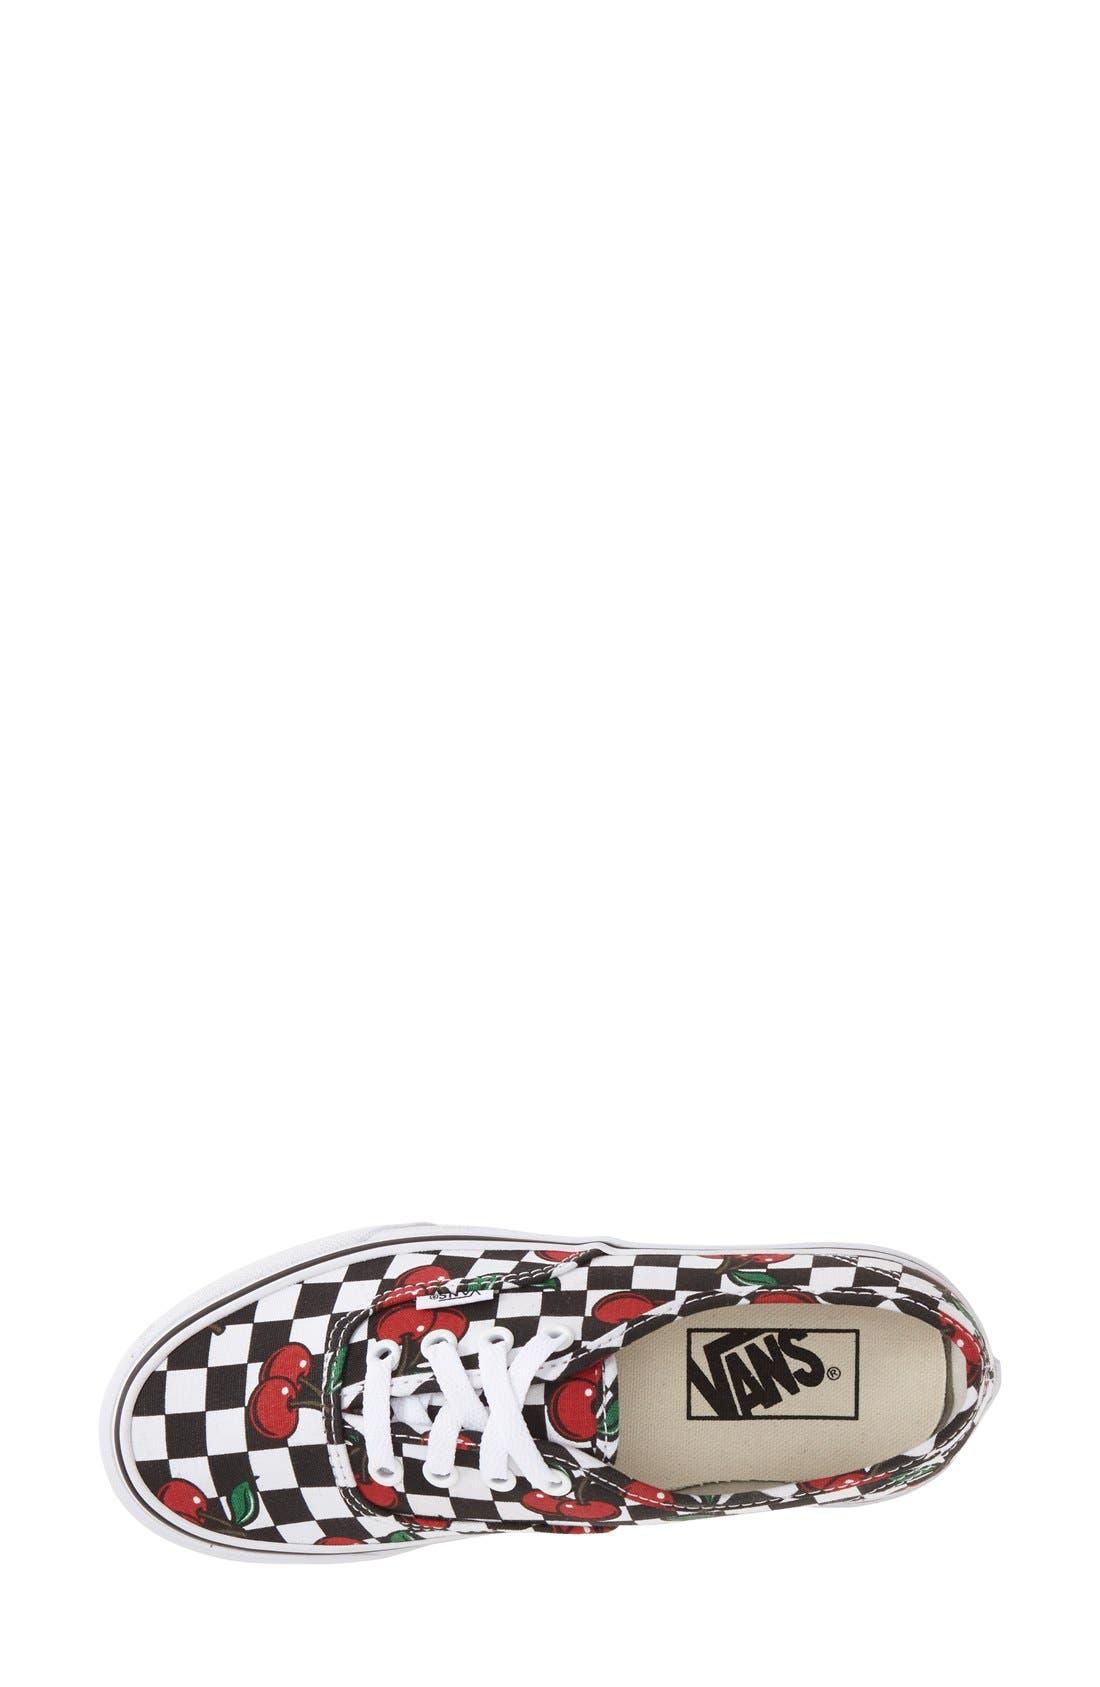 Alternate Image 3  - Vans 'Authentic - Cherry' Sneaker (Women)